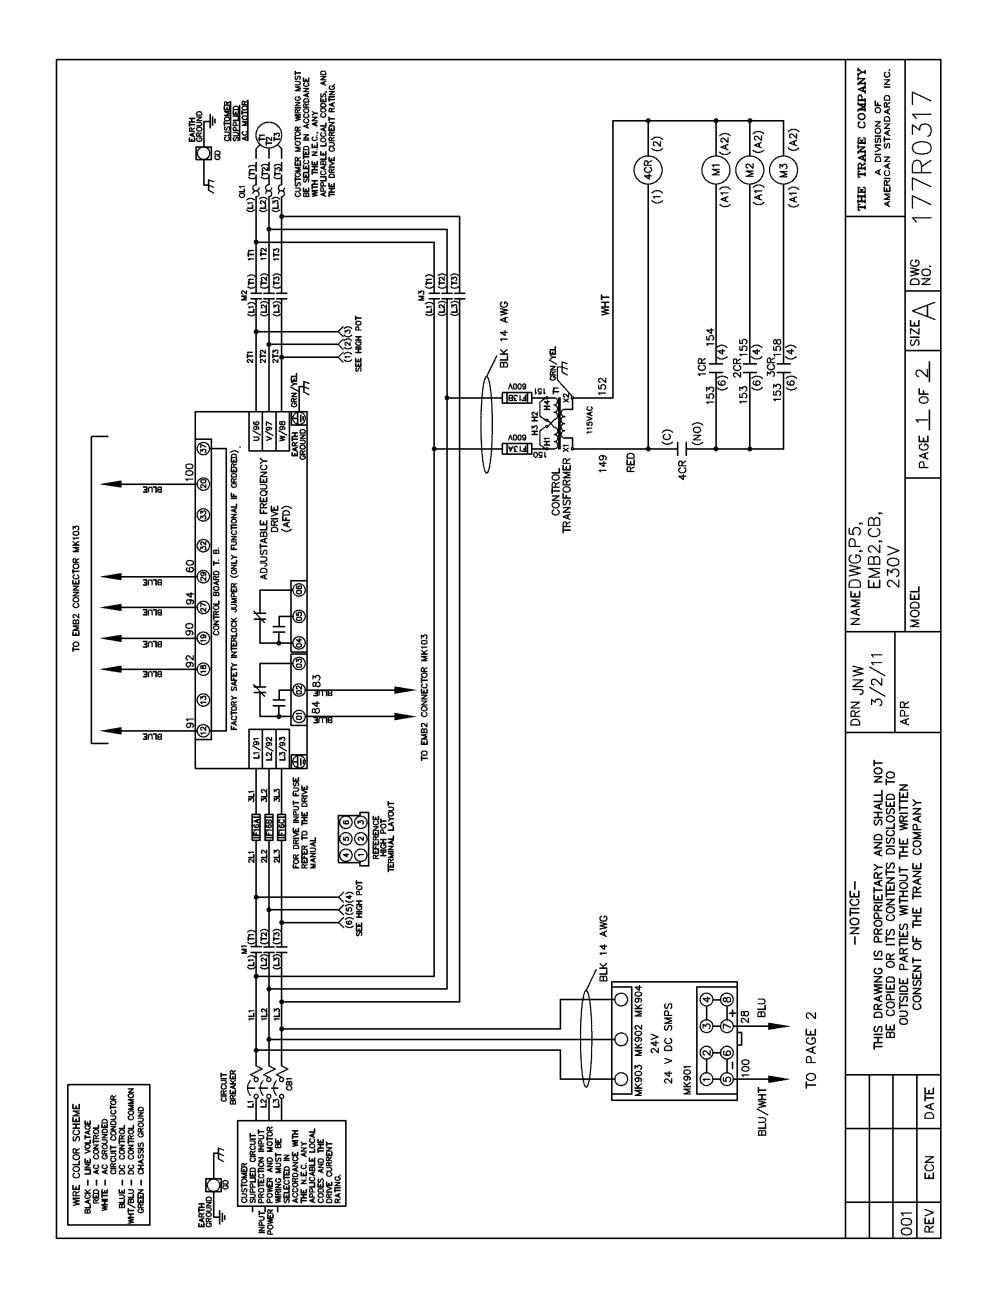 medium resolution of 677 beam wiring diagram simple wiring diagram schema staircase wiring diagram 677 beam wiring diagram